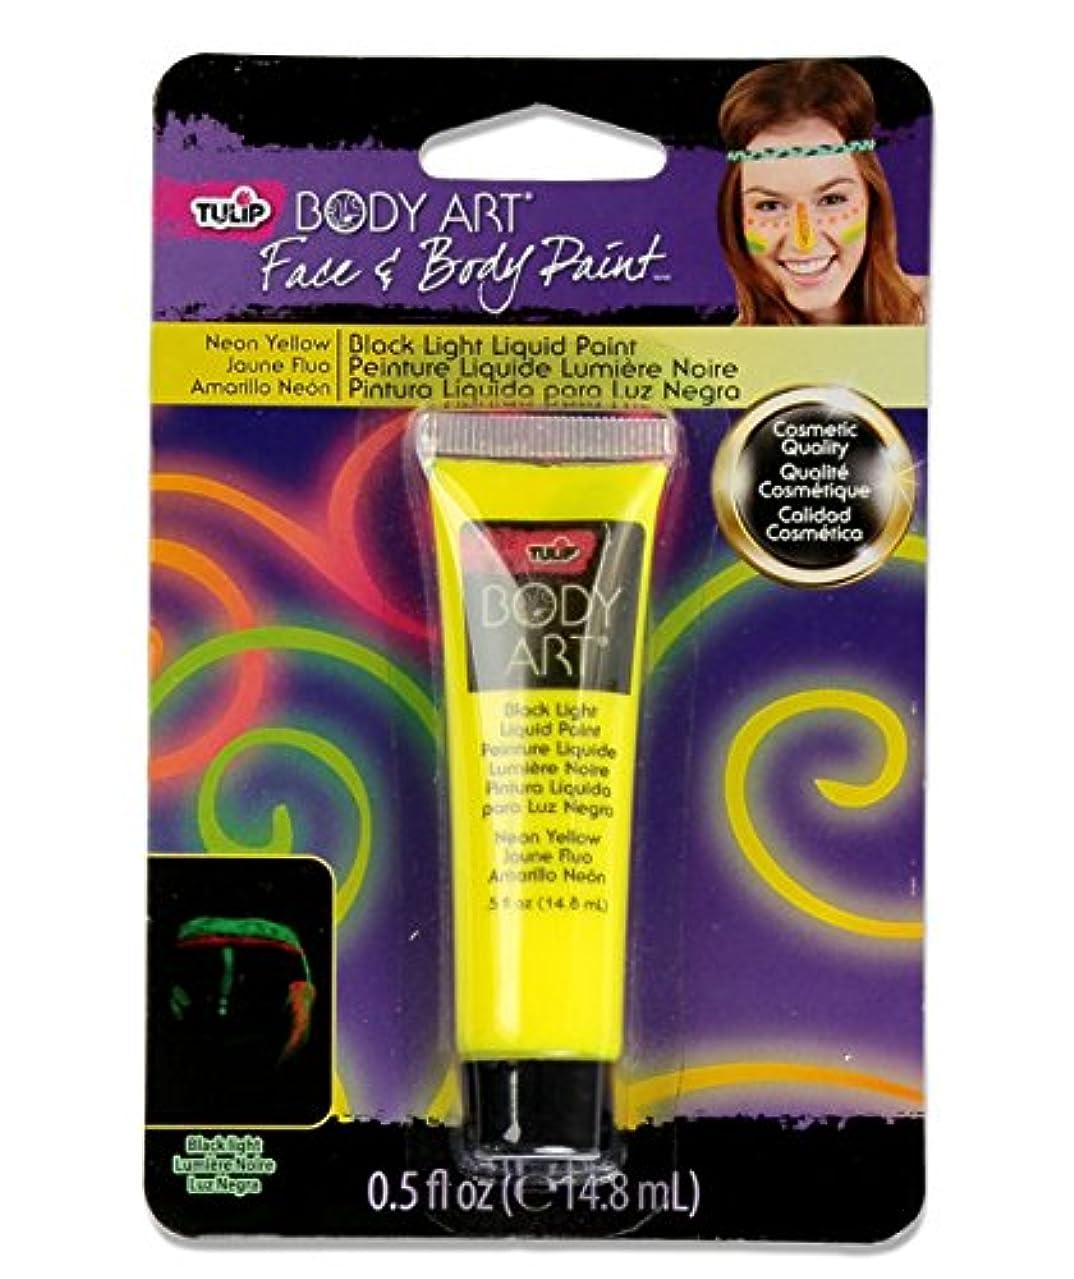 Tulip Body Art Face & Body Paint, 0.5 oz, Black/Light Yellow